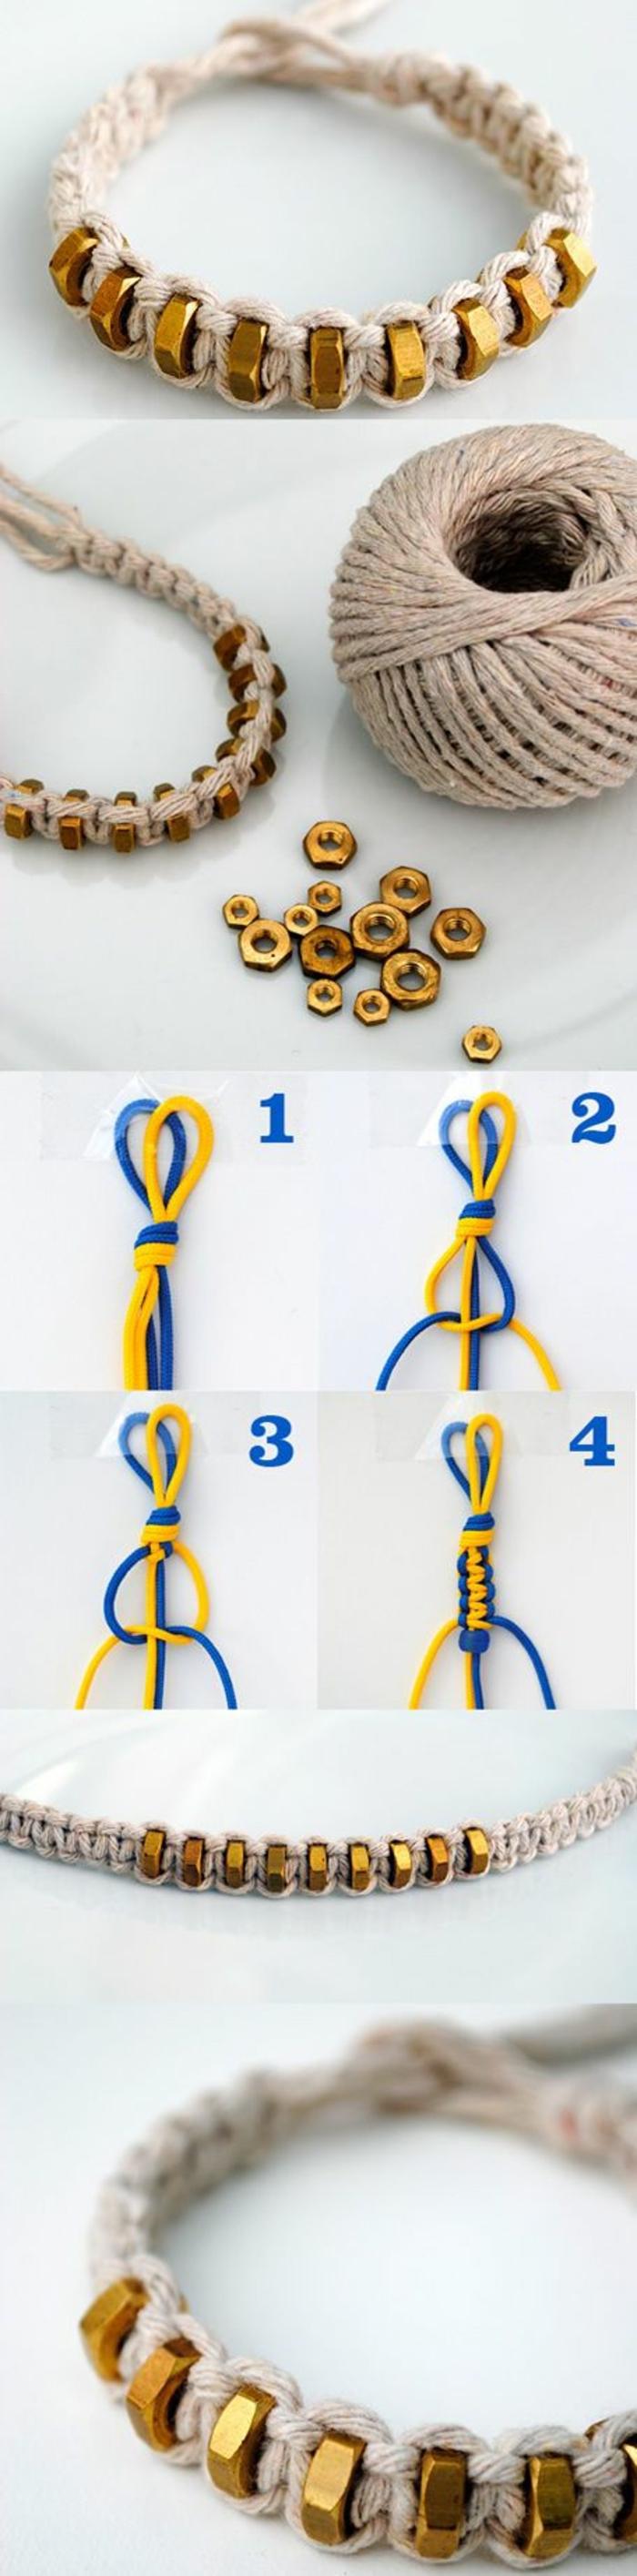 beige yarn, screws amongst it, braided bracelet, easy diy projects, diy tutorial, step by step